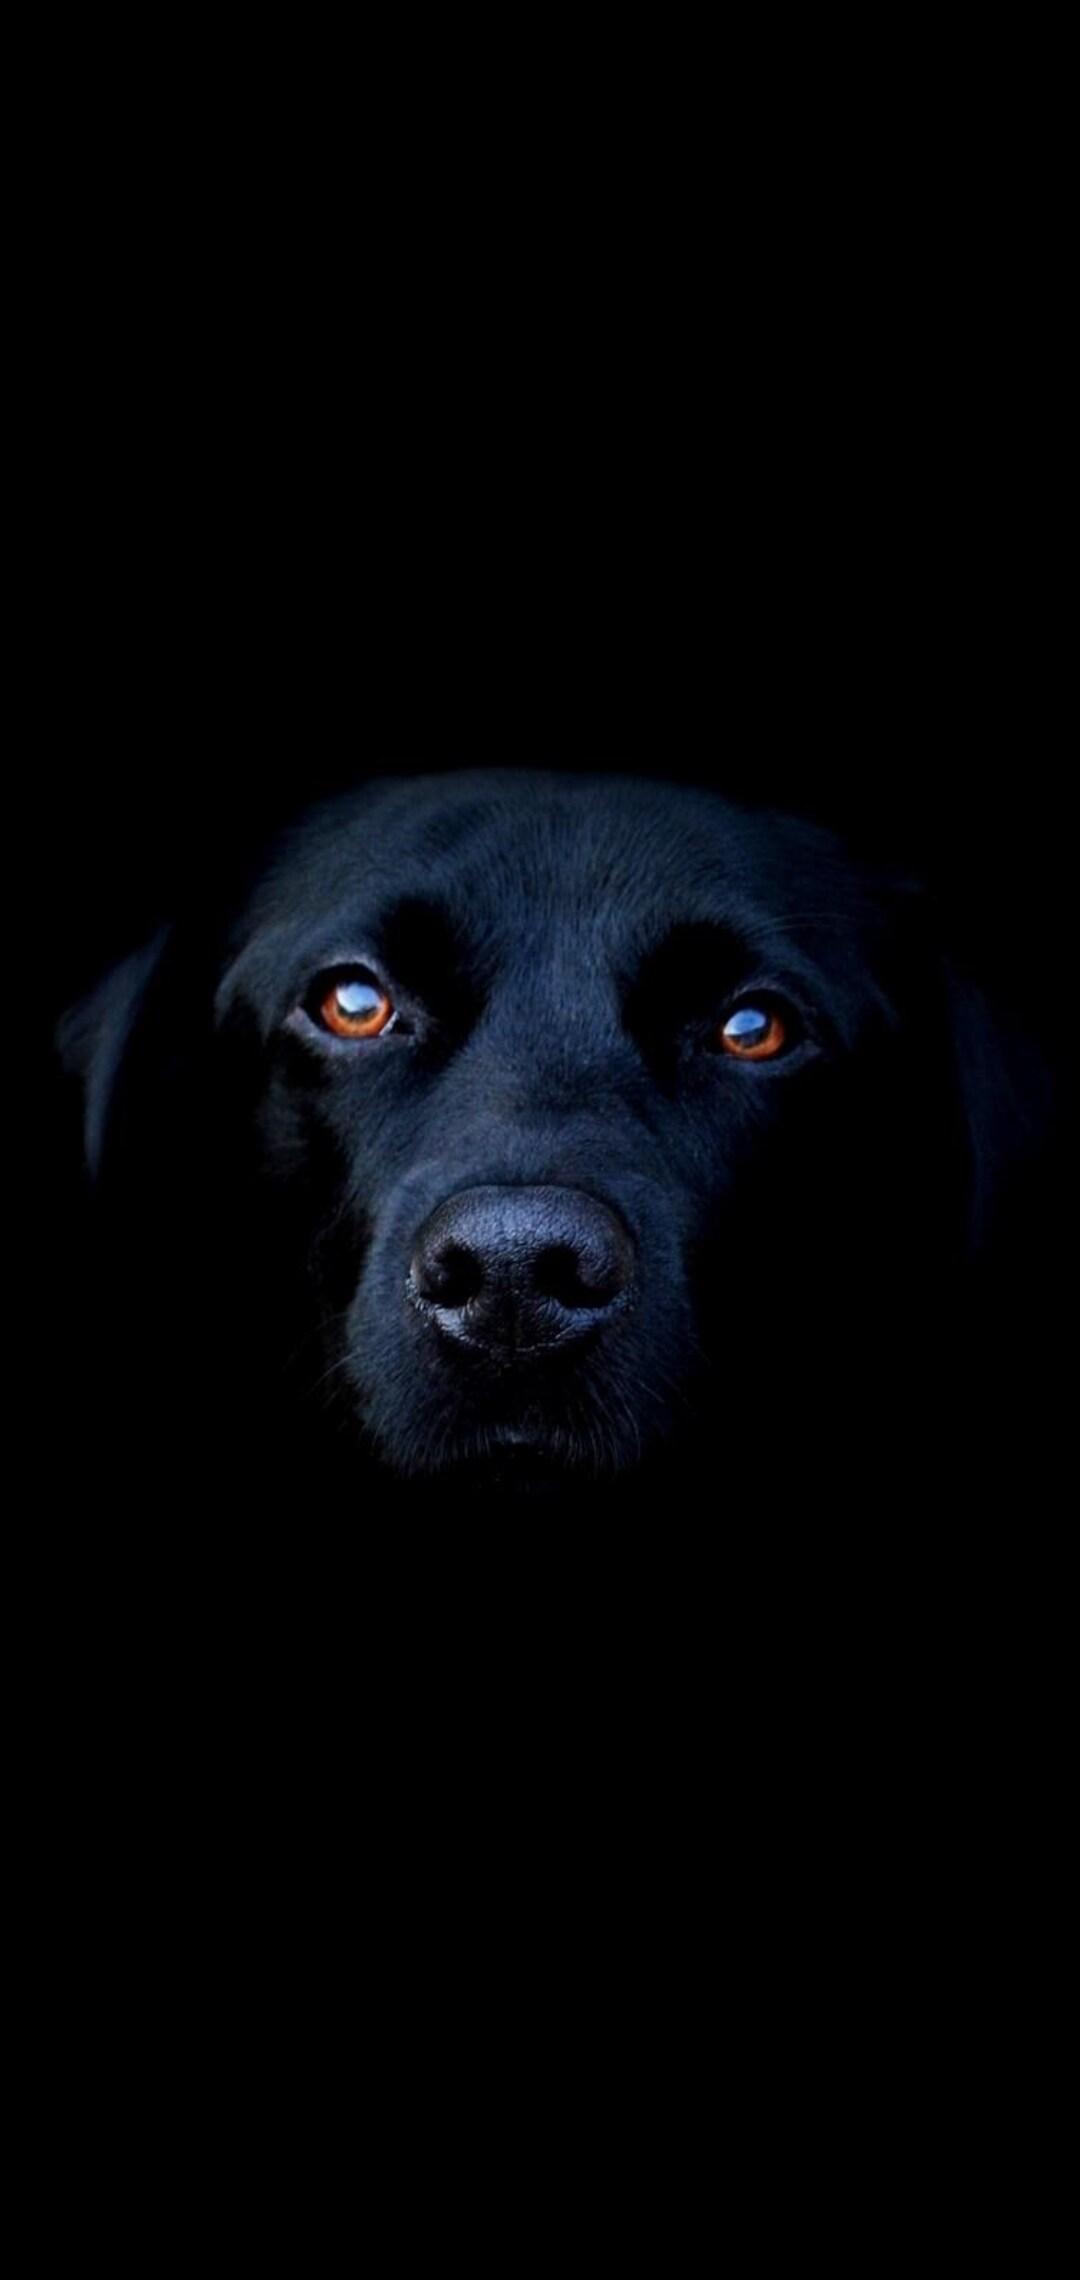 black-dog-image.jpg